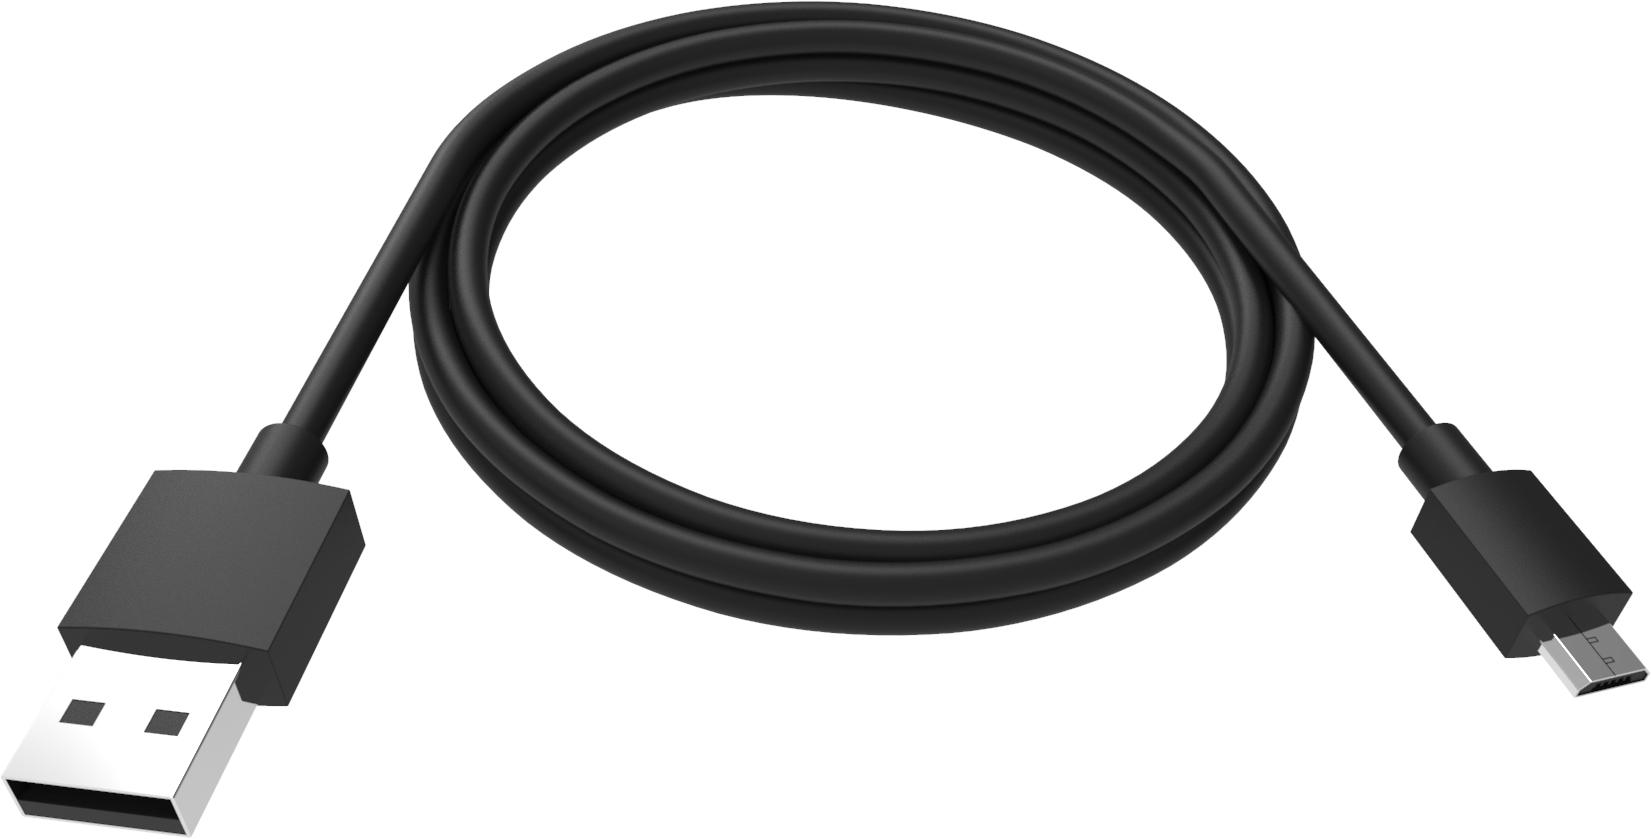 Vision TC-2MUSBM-BL USB cable 2 m 2.0 USB A Micro-USB B Black